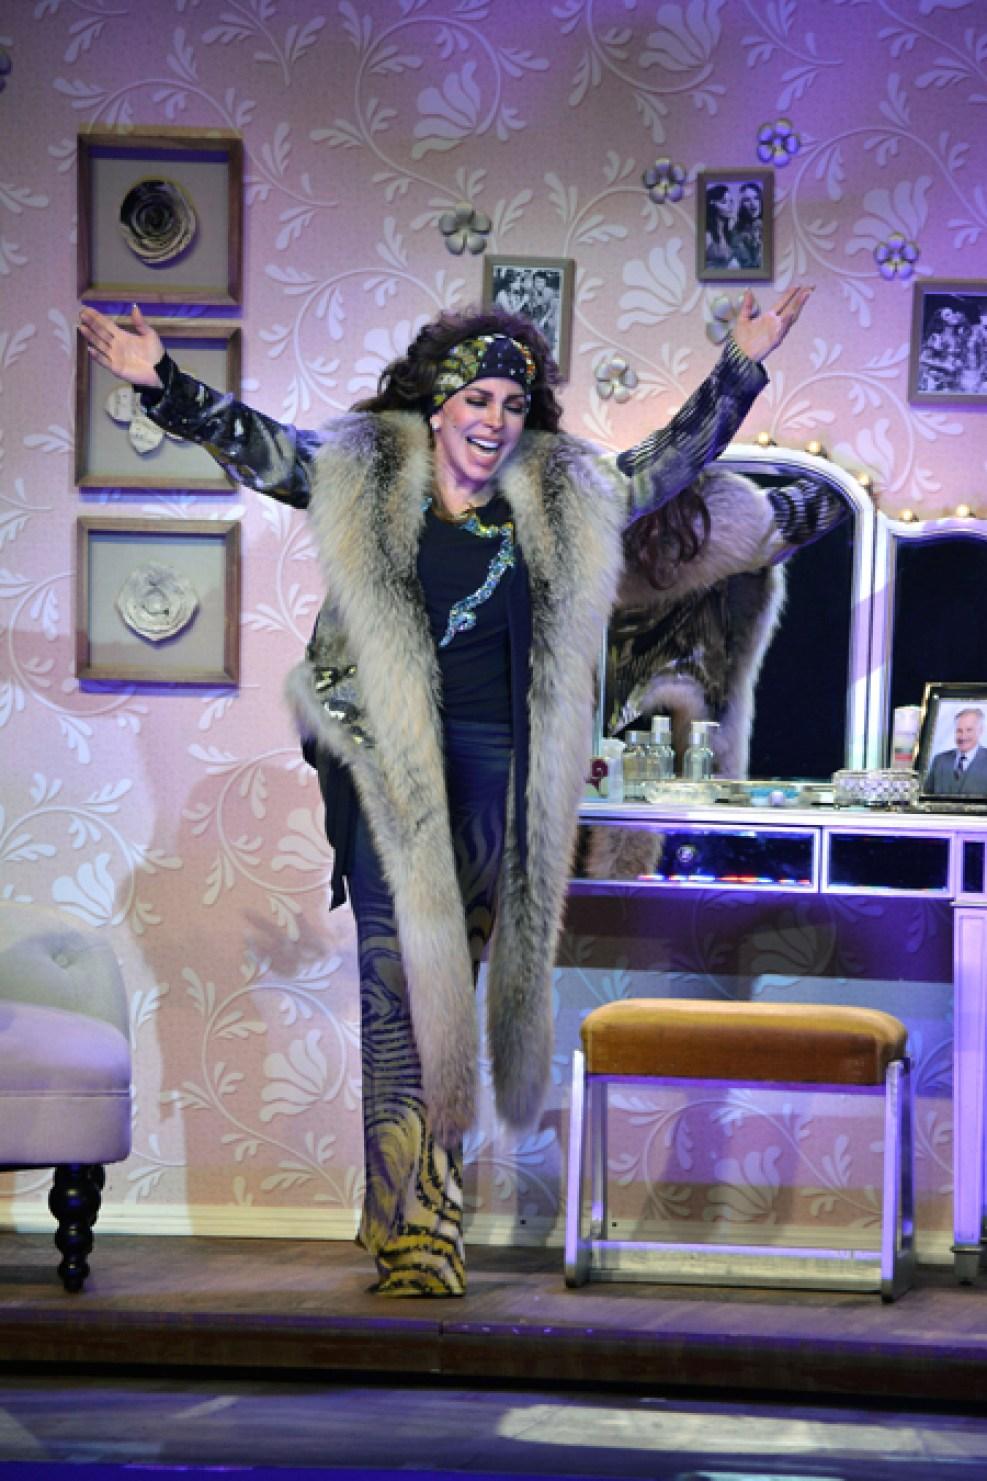 http://media.telemundo51.com/images/987*1481/veronica-castro-teatro-aplauso-02.jpg